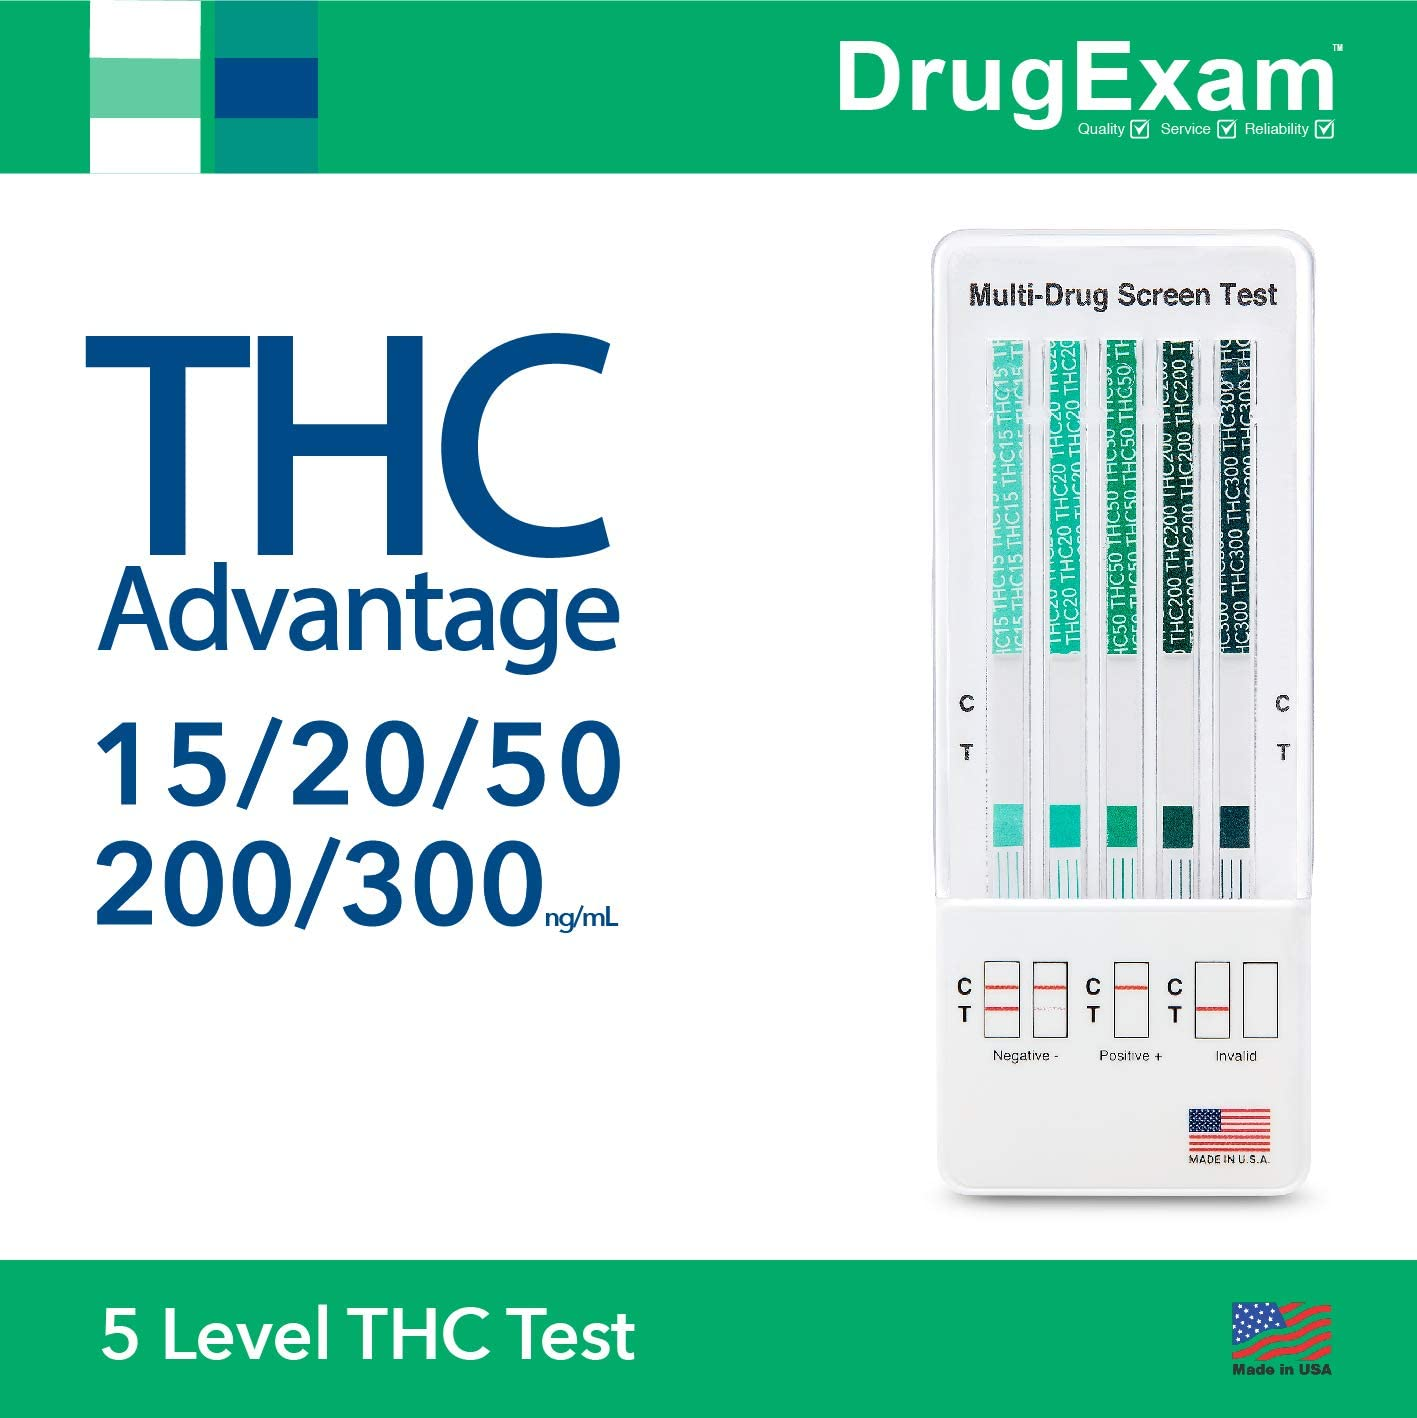 10 Pack Super sale period limited - DrugExam THC Advantage USA Marijua Made Under blast sales Multi in Level